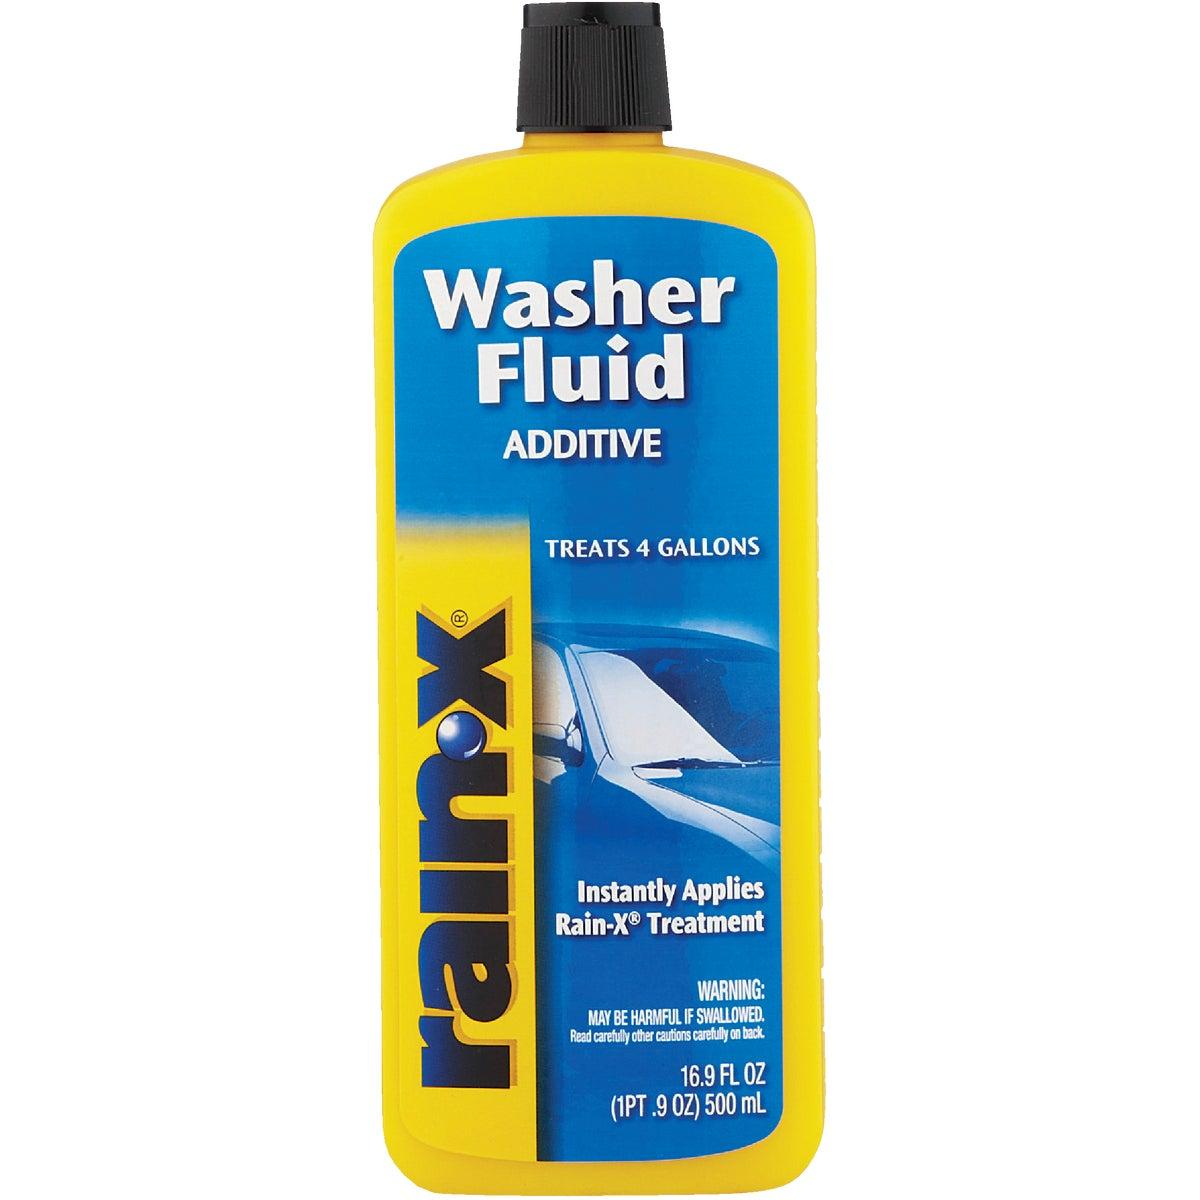 Rain-X Wash Additive